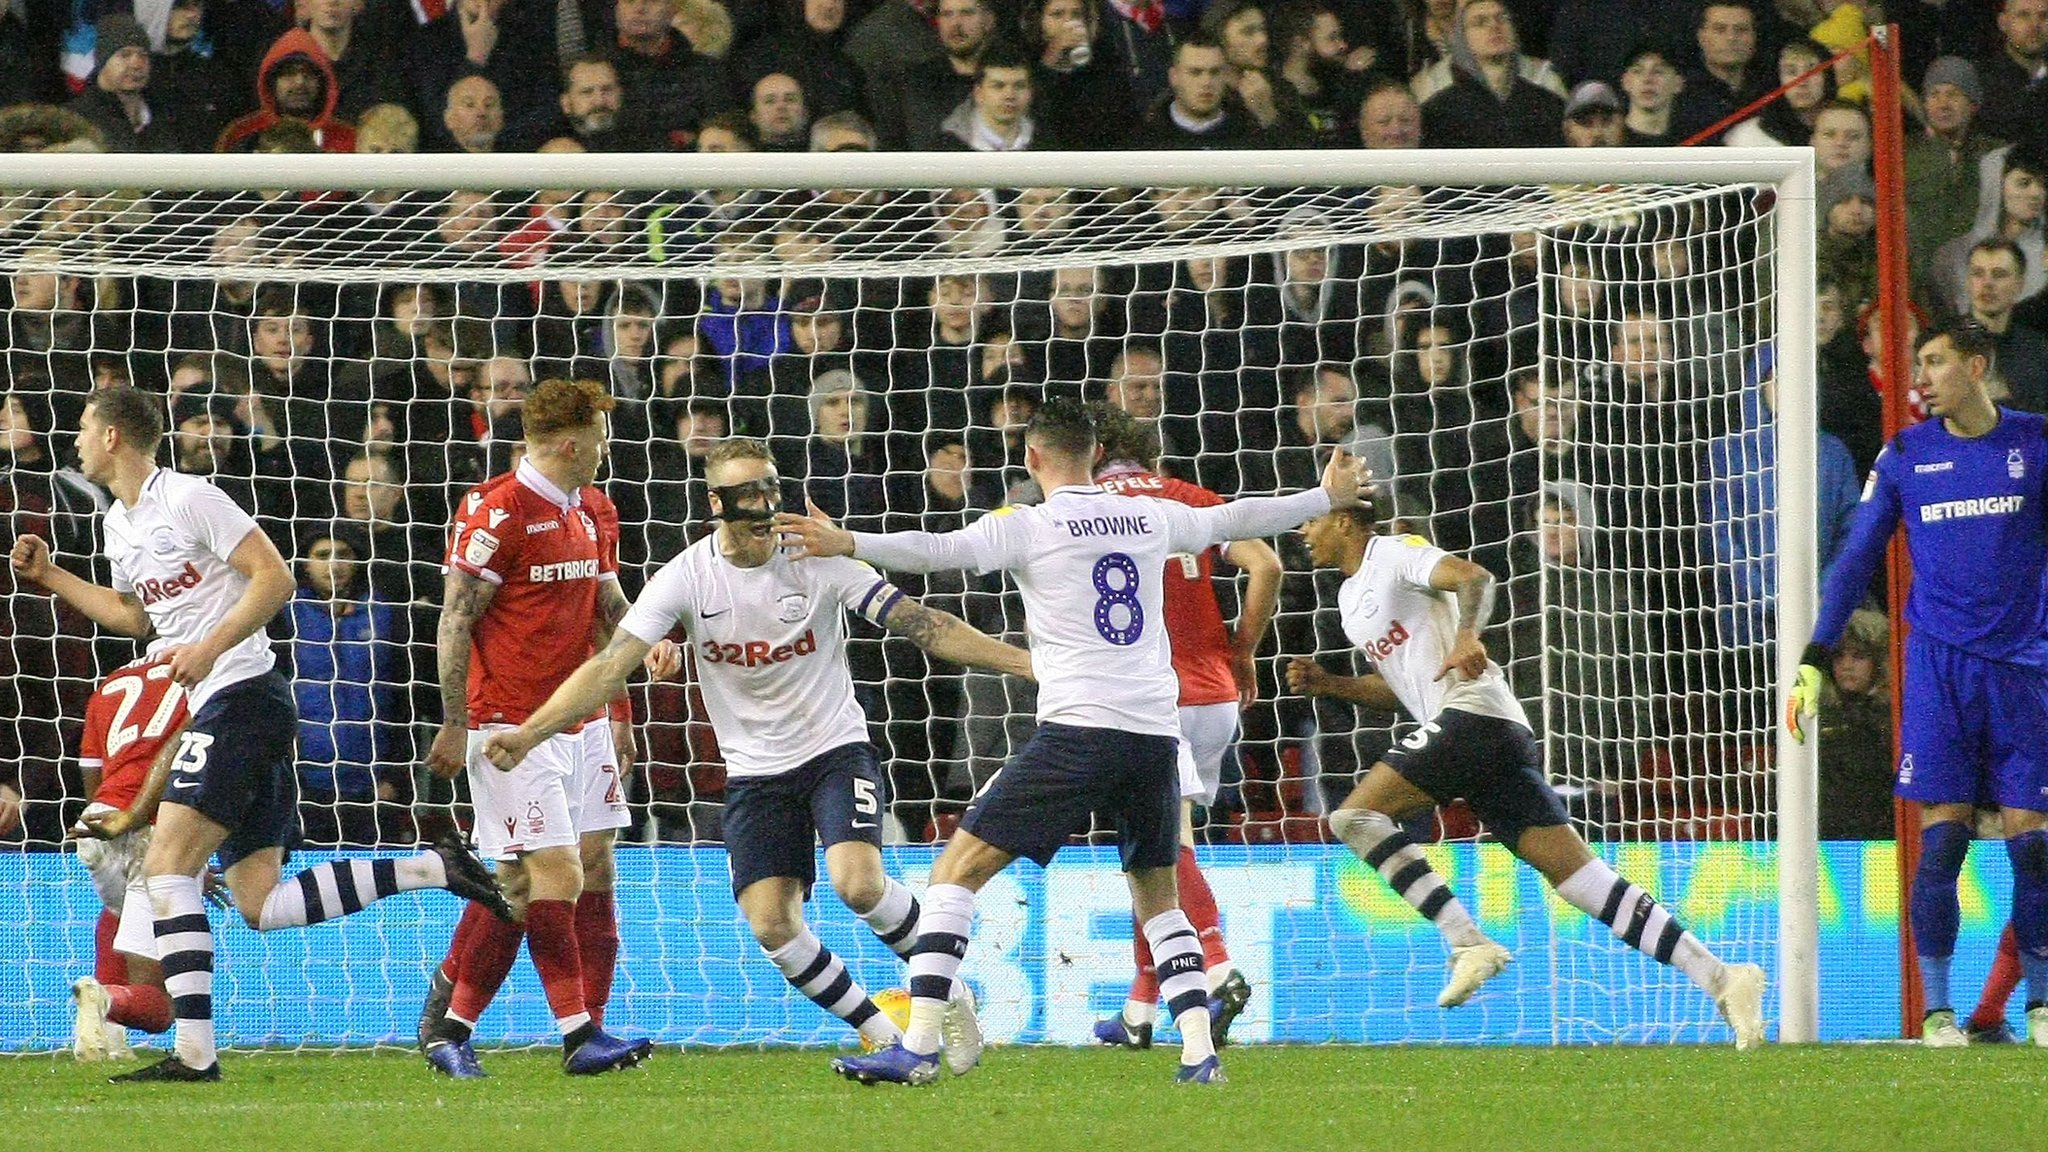 Nottingham Forest 0-1 Preston North End: Lewis Moult goal secures away win